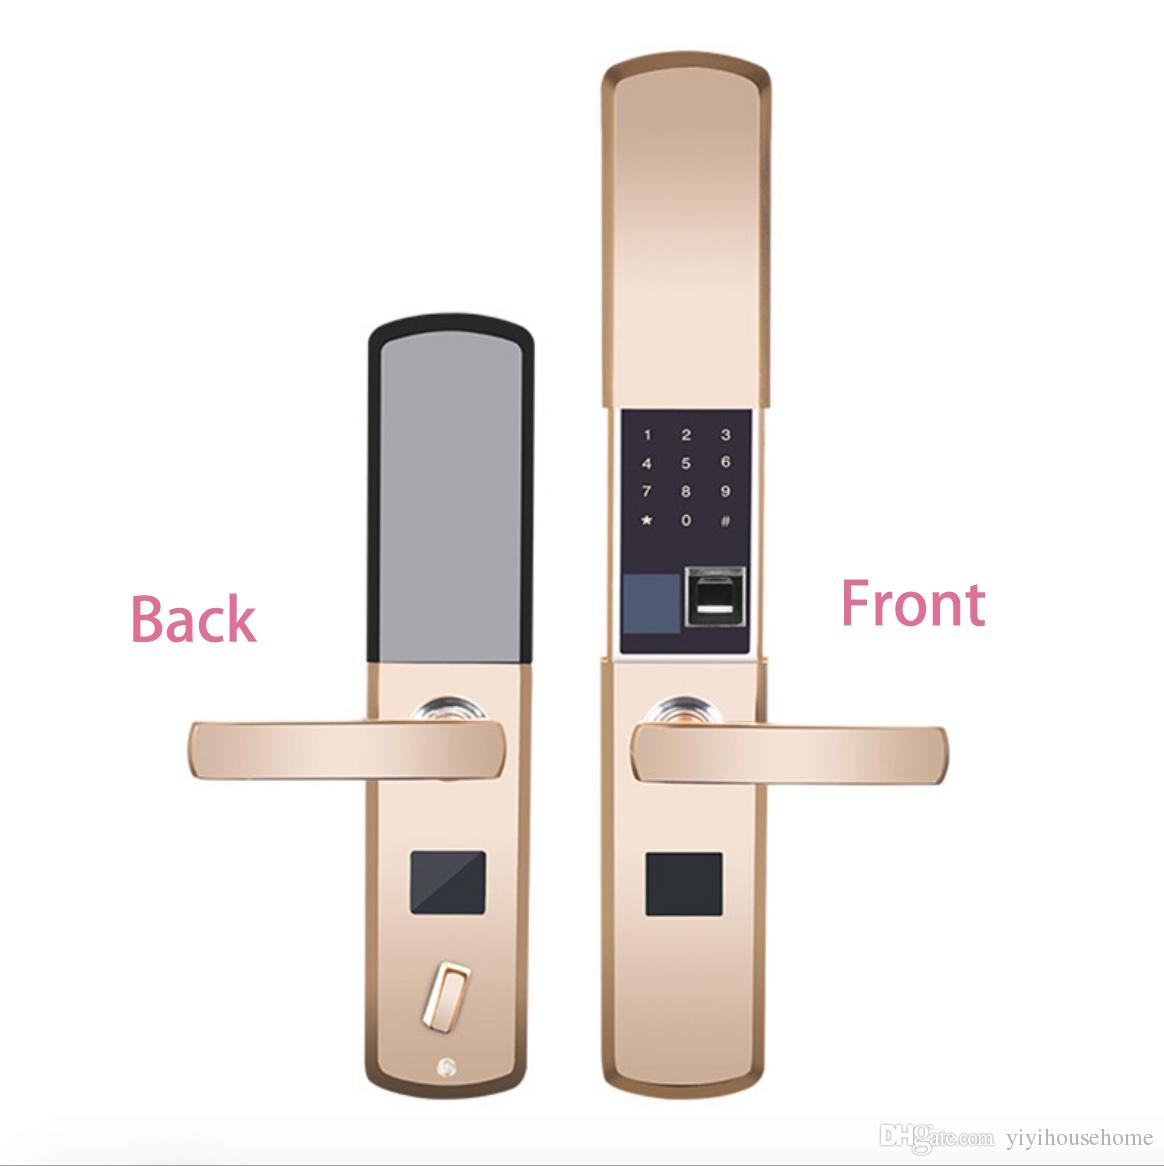 Pin защиты от кражи